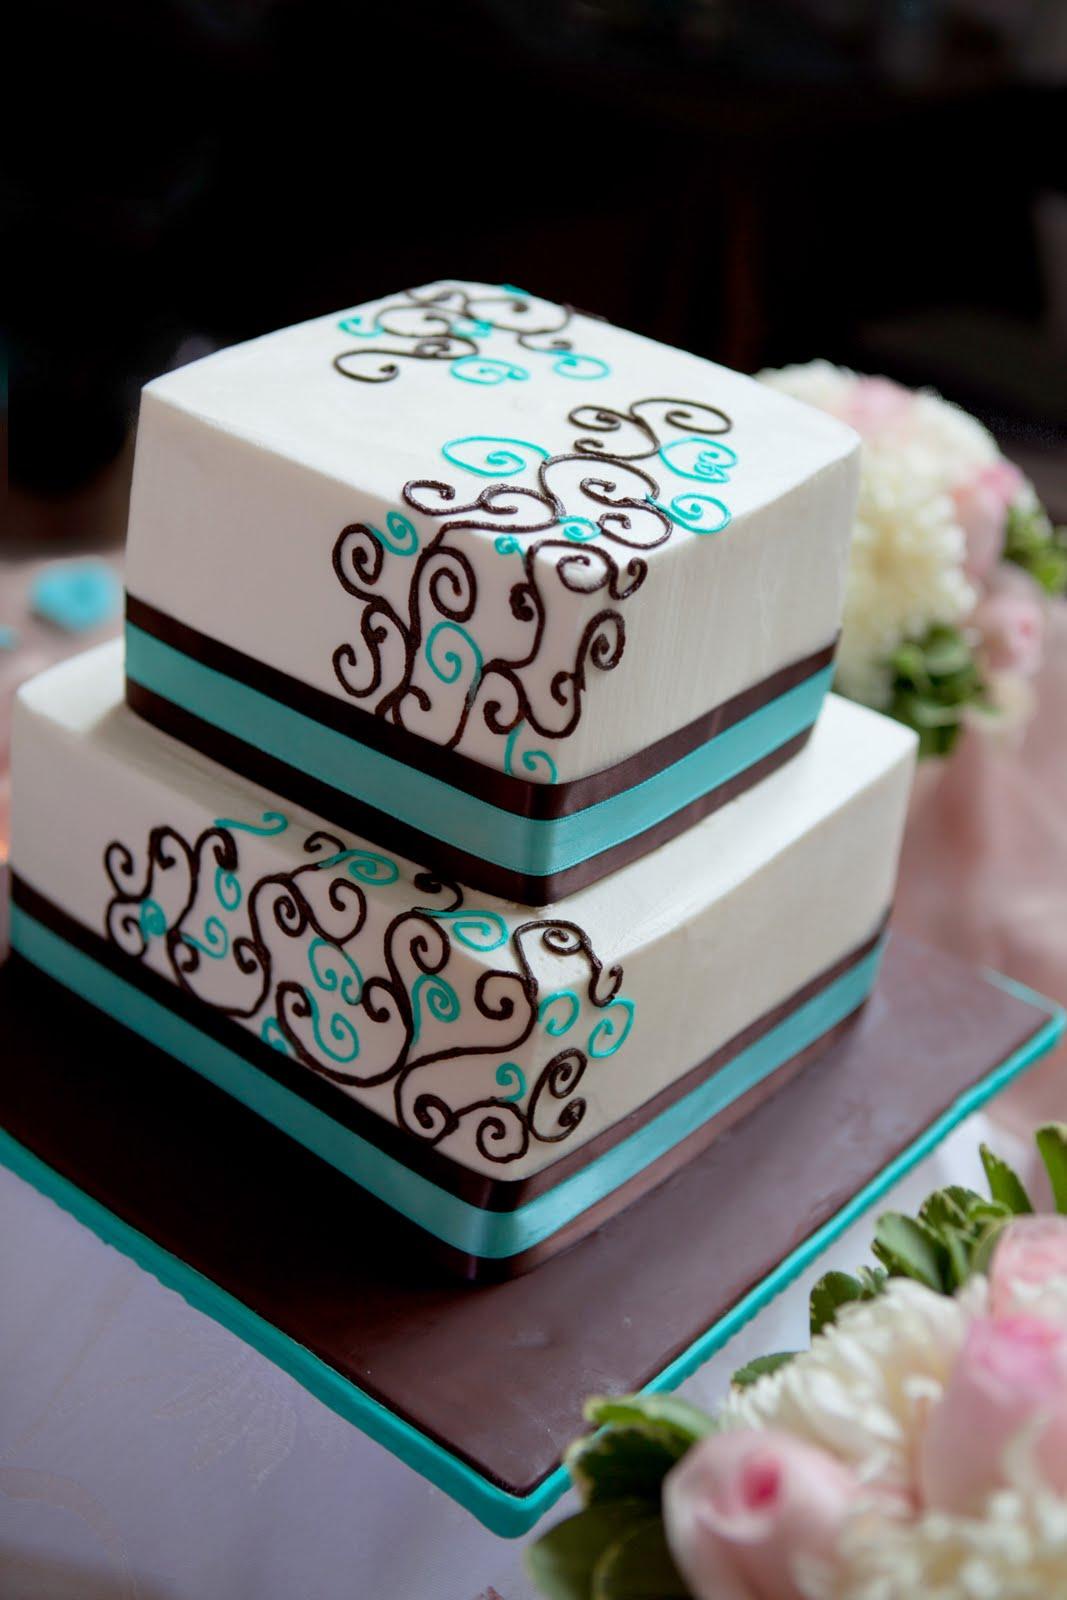 Simple Elegant Birthday Cake Ideas Image Inspiration of Cake and